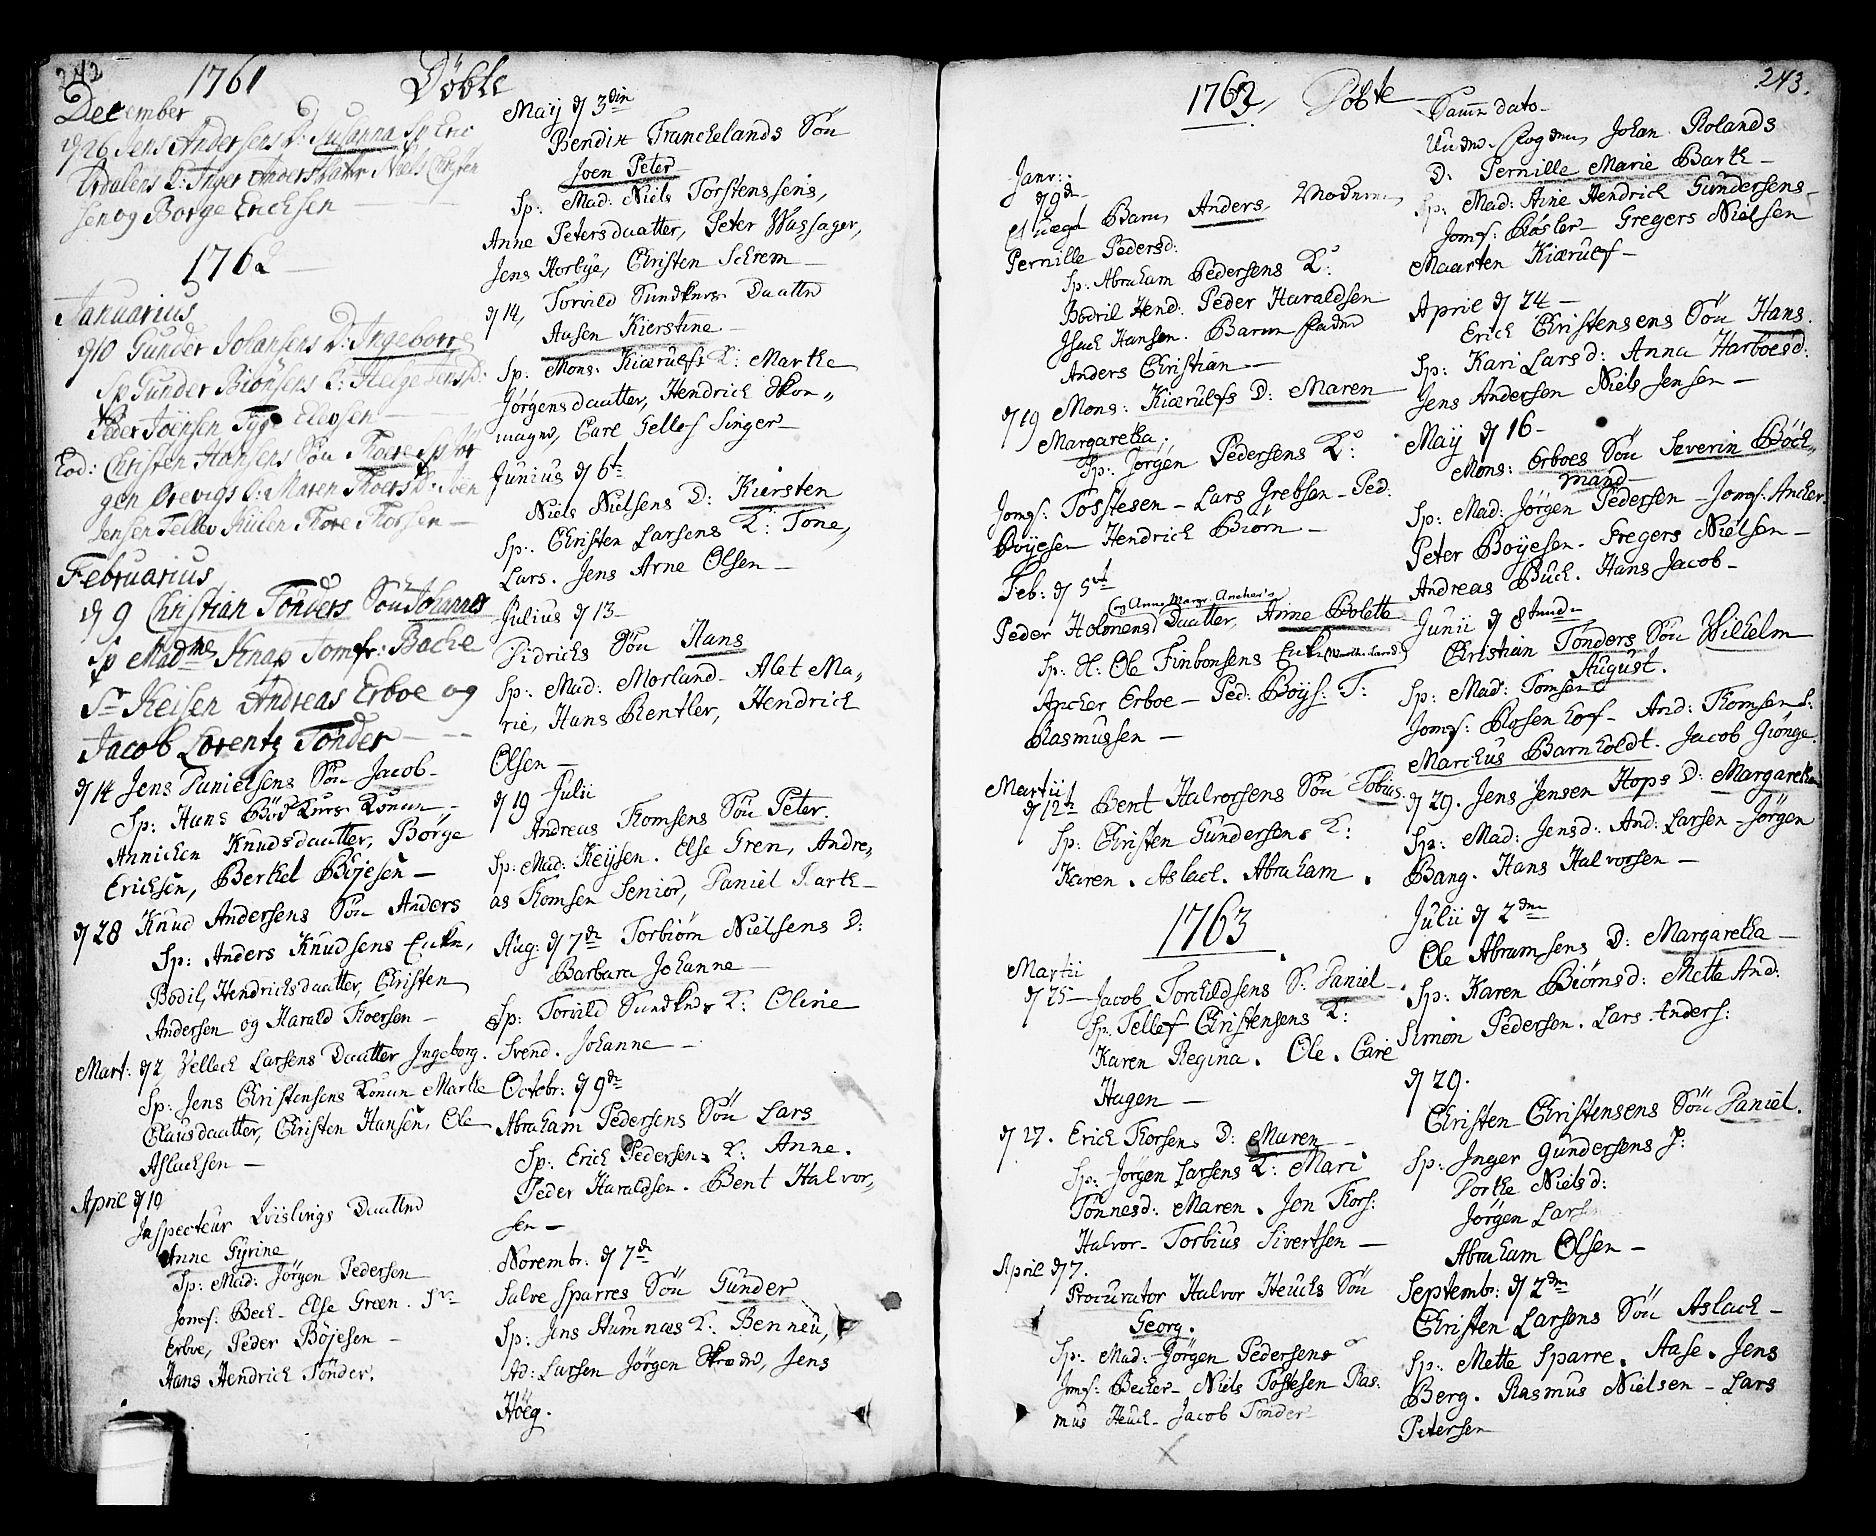 SAKO, Kragerø kirkebøker, F/Fa/L0001: Ministerialbok nr. 1, 1702-1766, s. 242-243